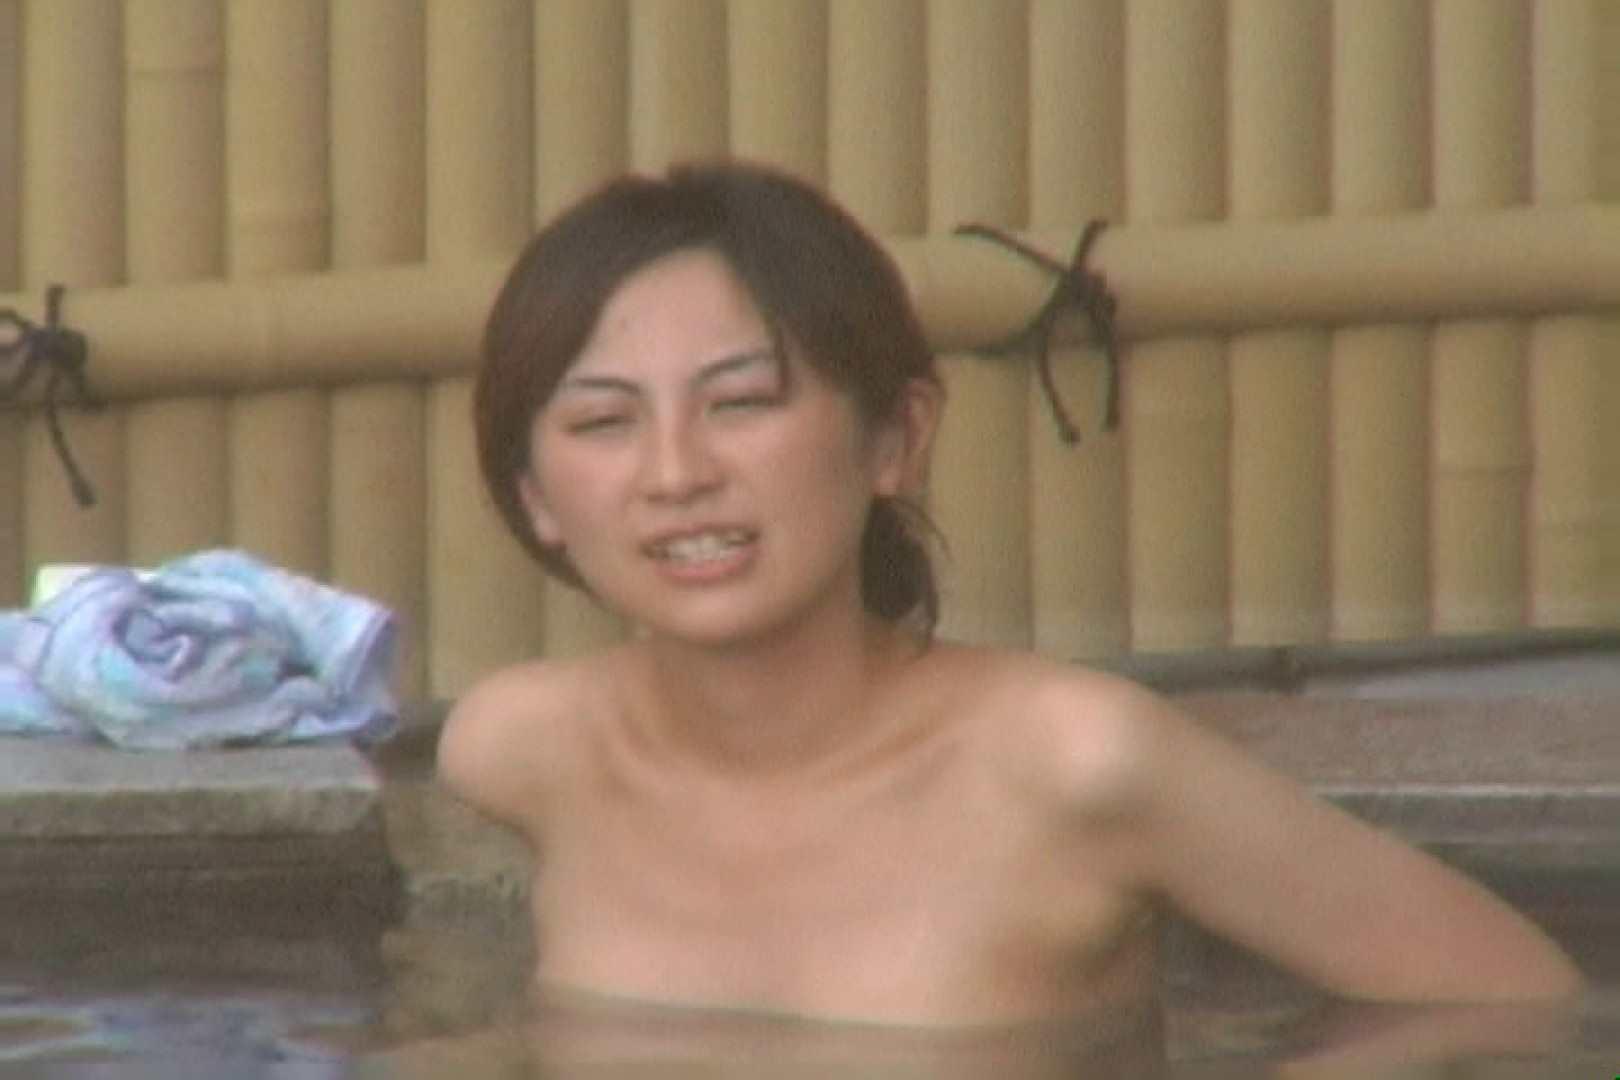 Aquaな露天風呂Vol.26【VIP】 OLセックス 盗み撮りオマンコ動画キャプチャ 59画像 56